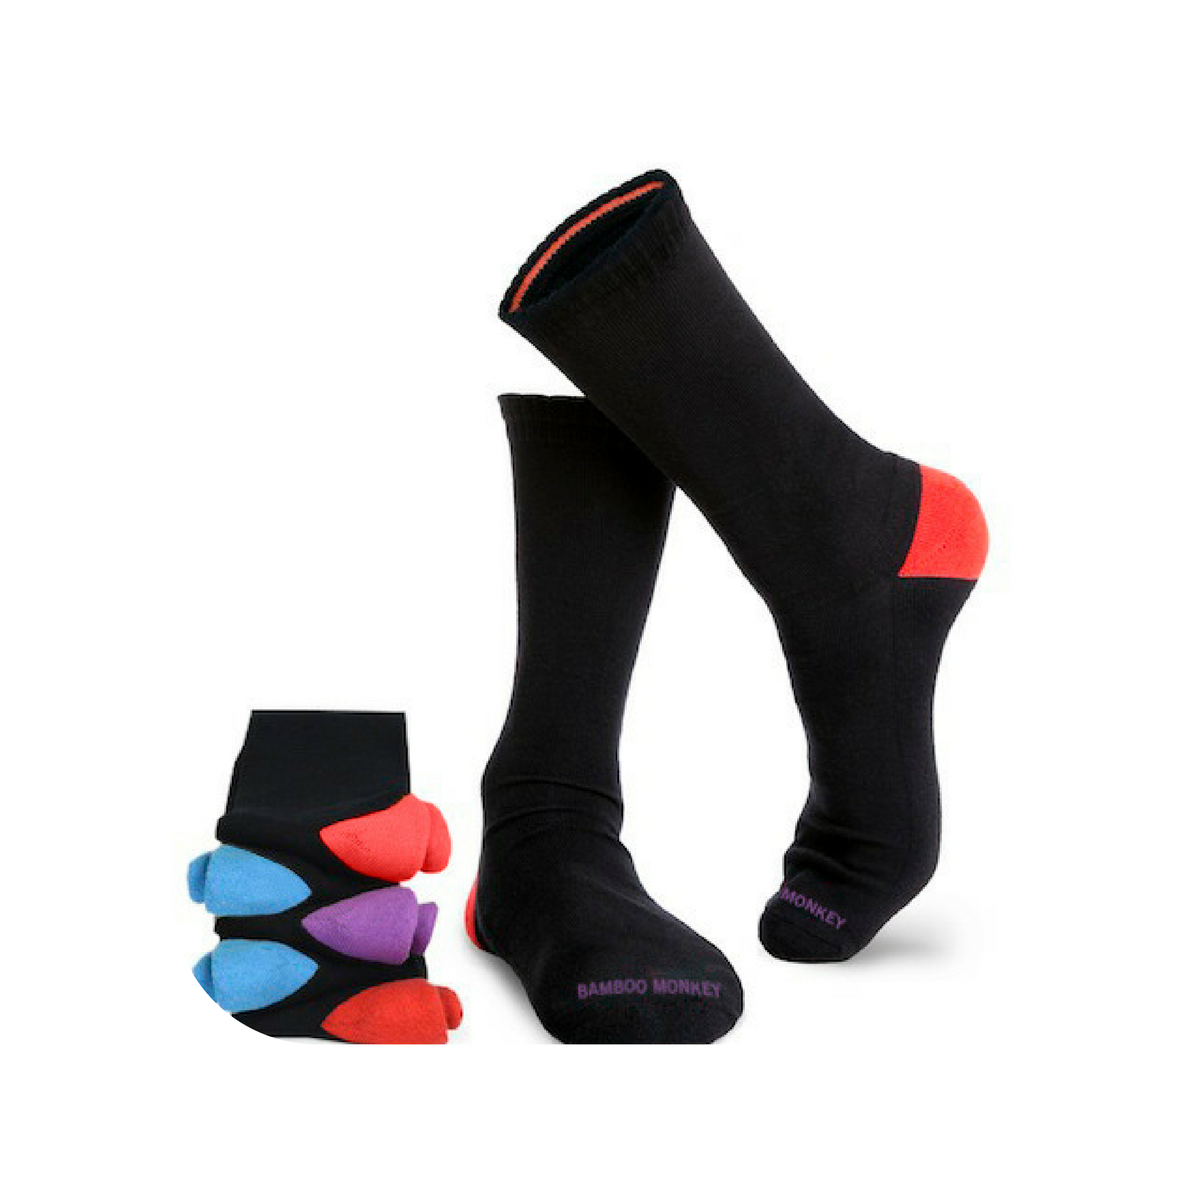 10 pairs of classic black bamboo socks